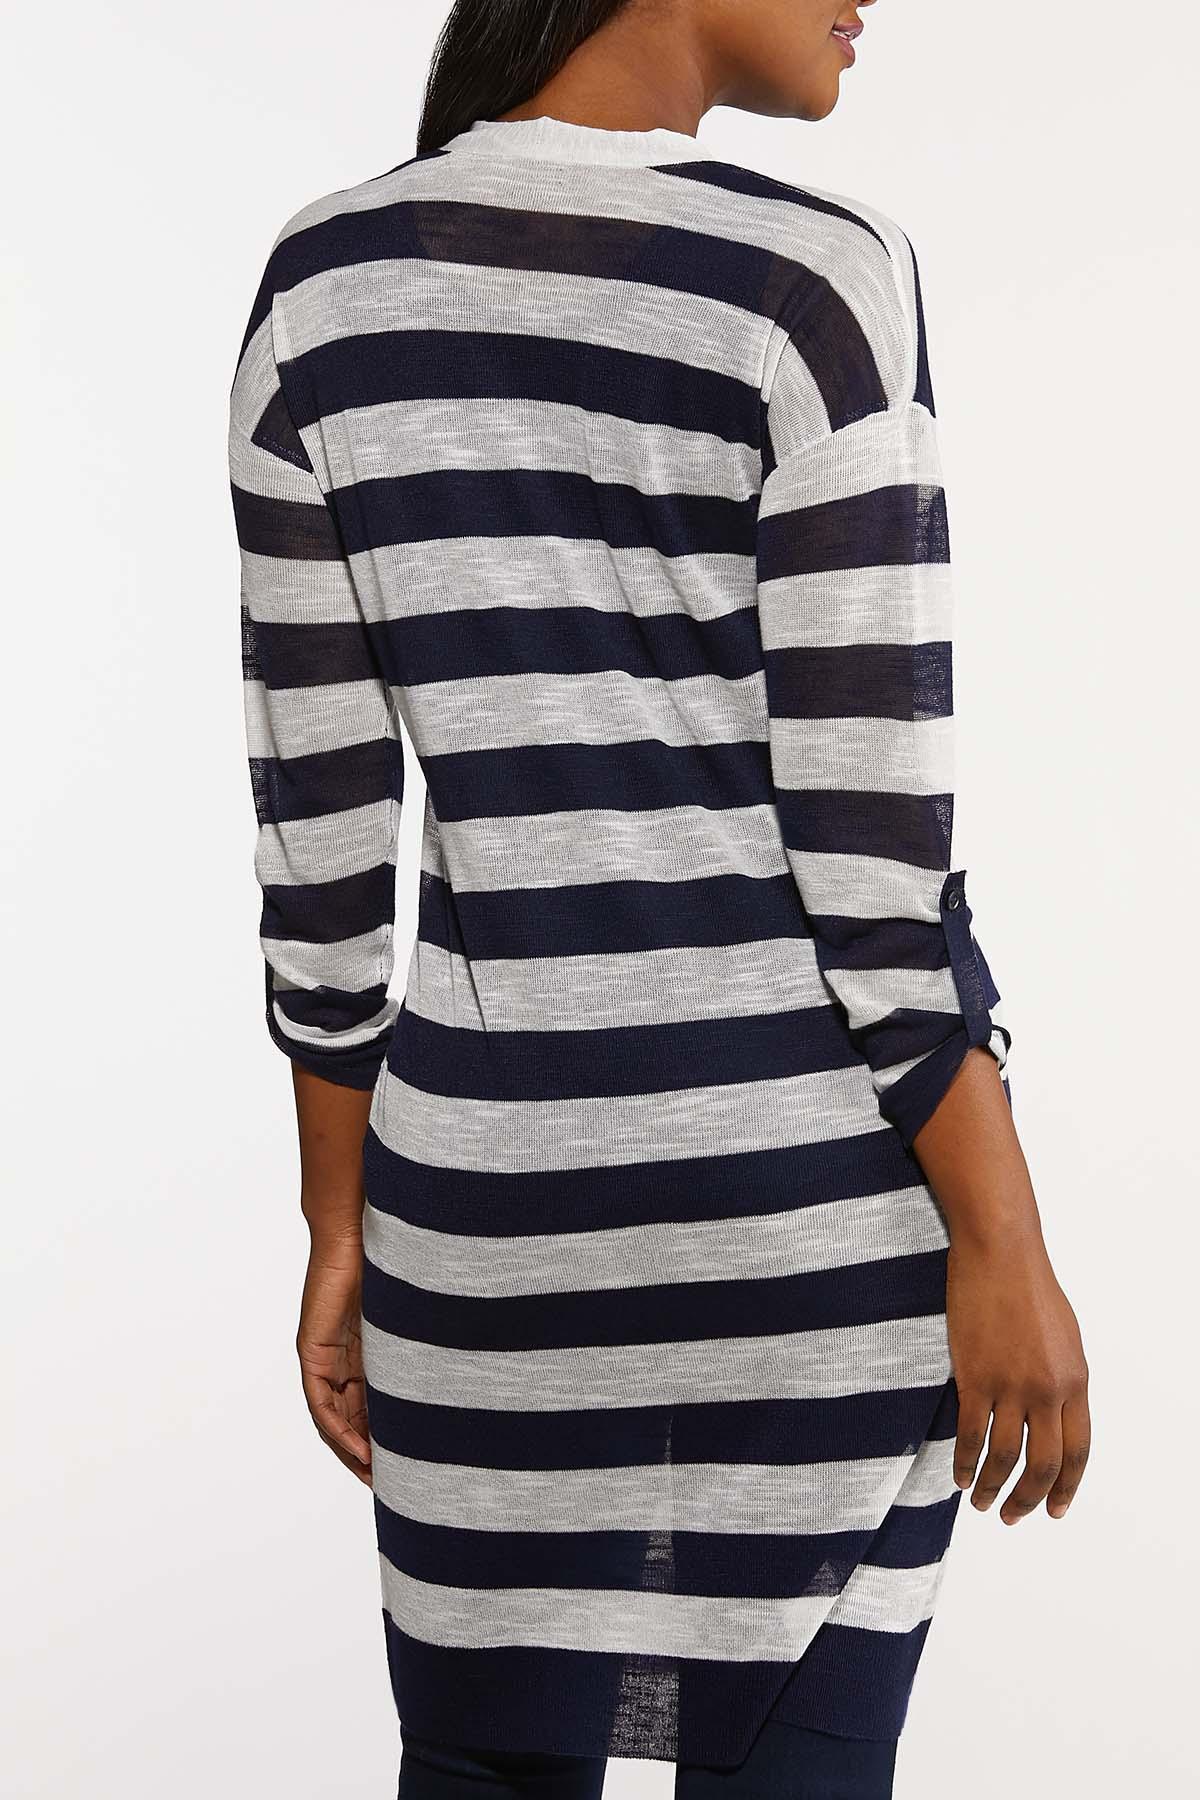 Navy Stripe Cardigan Sweater (Item #44187223)